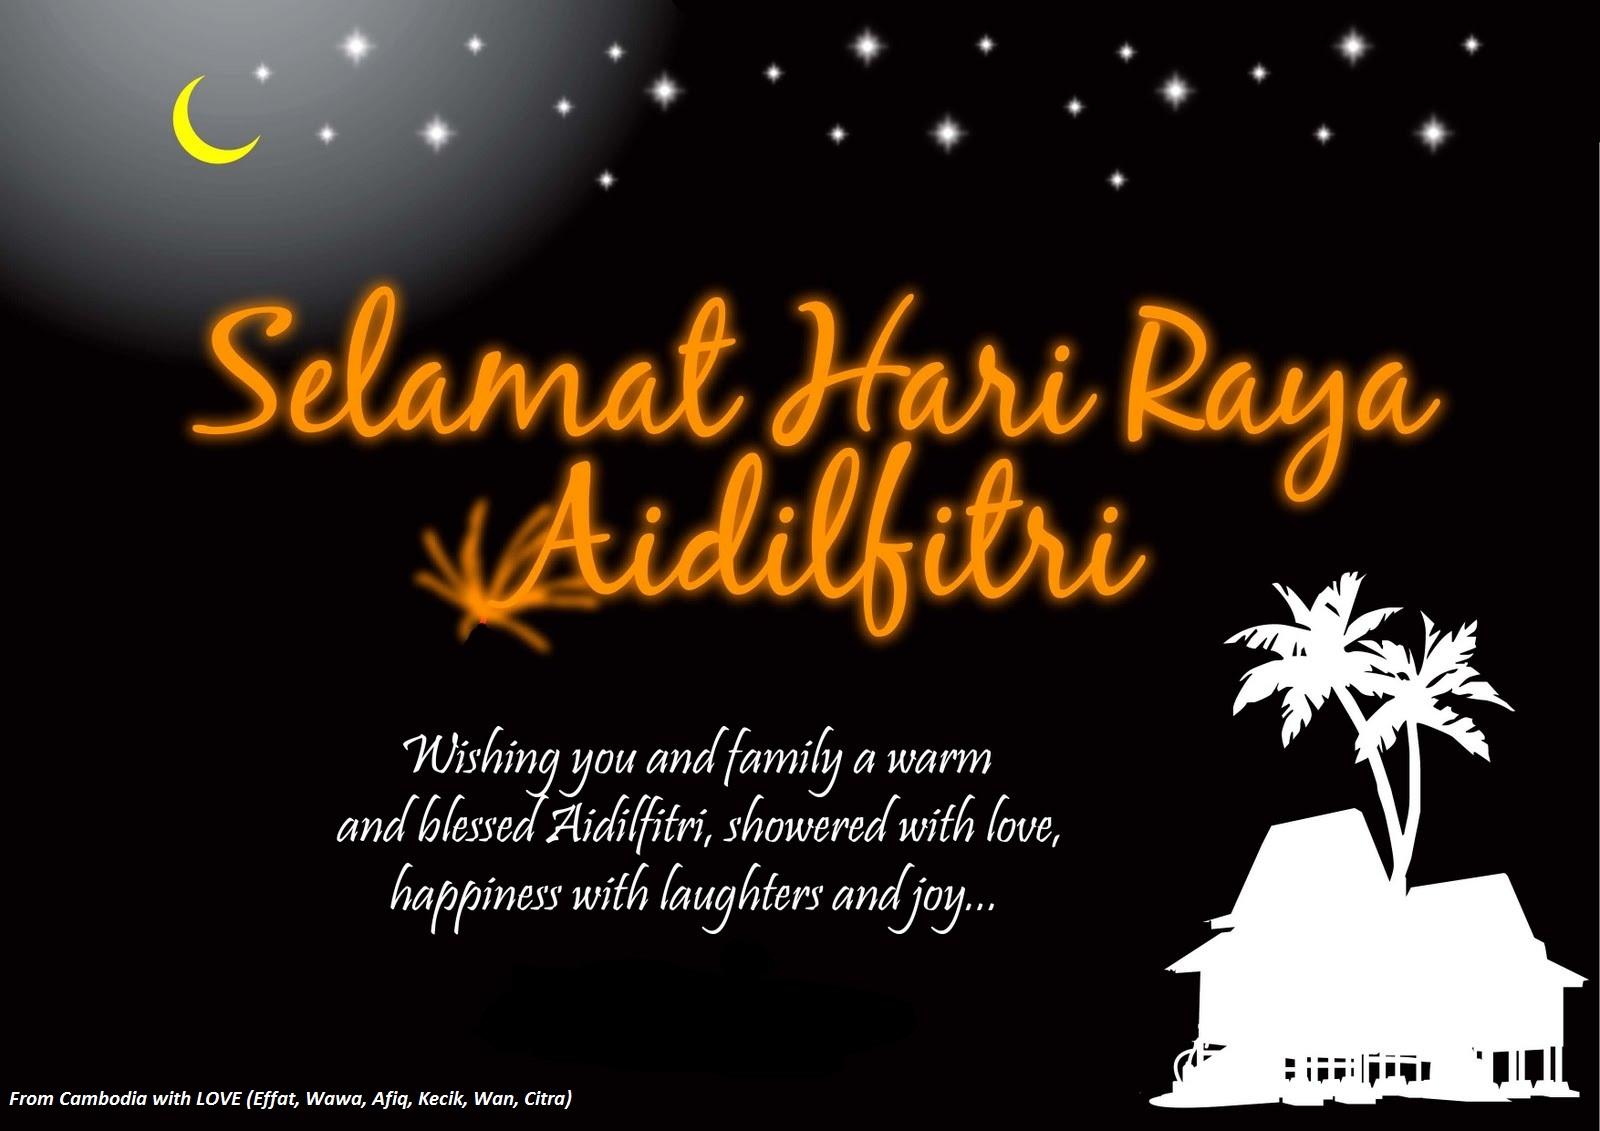 Selamat hari raya aidilfitri 2015 wishes greeting sms messages kristyandbryce Image collections